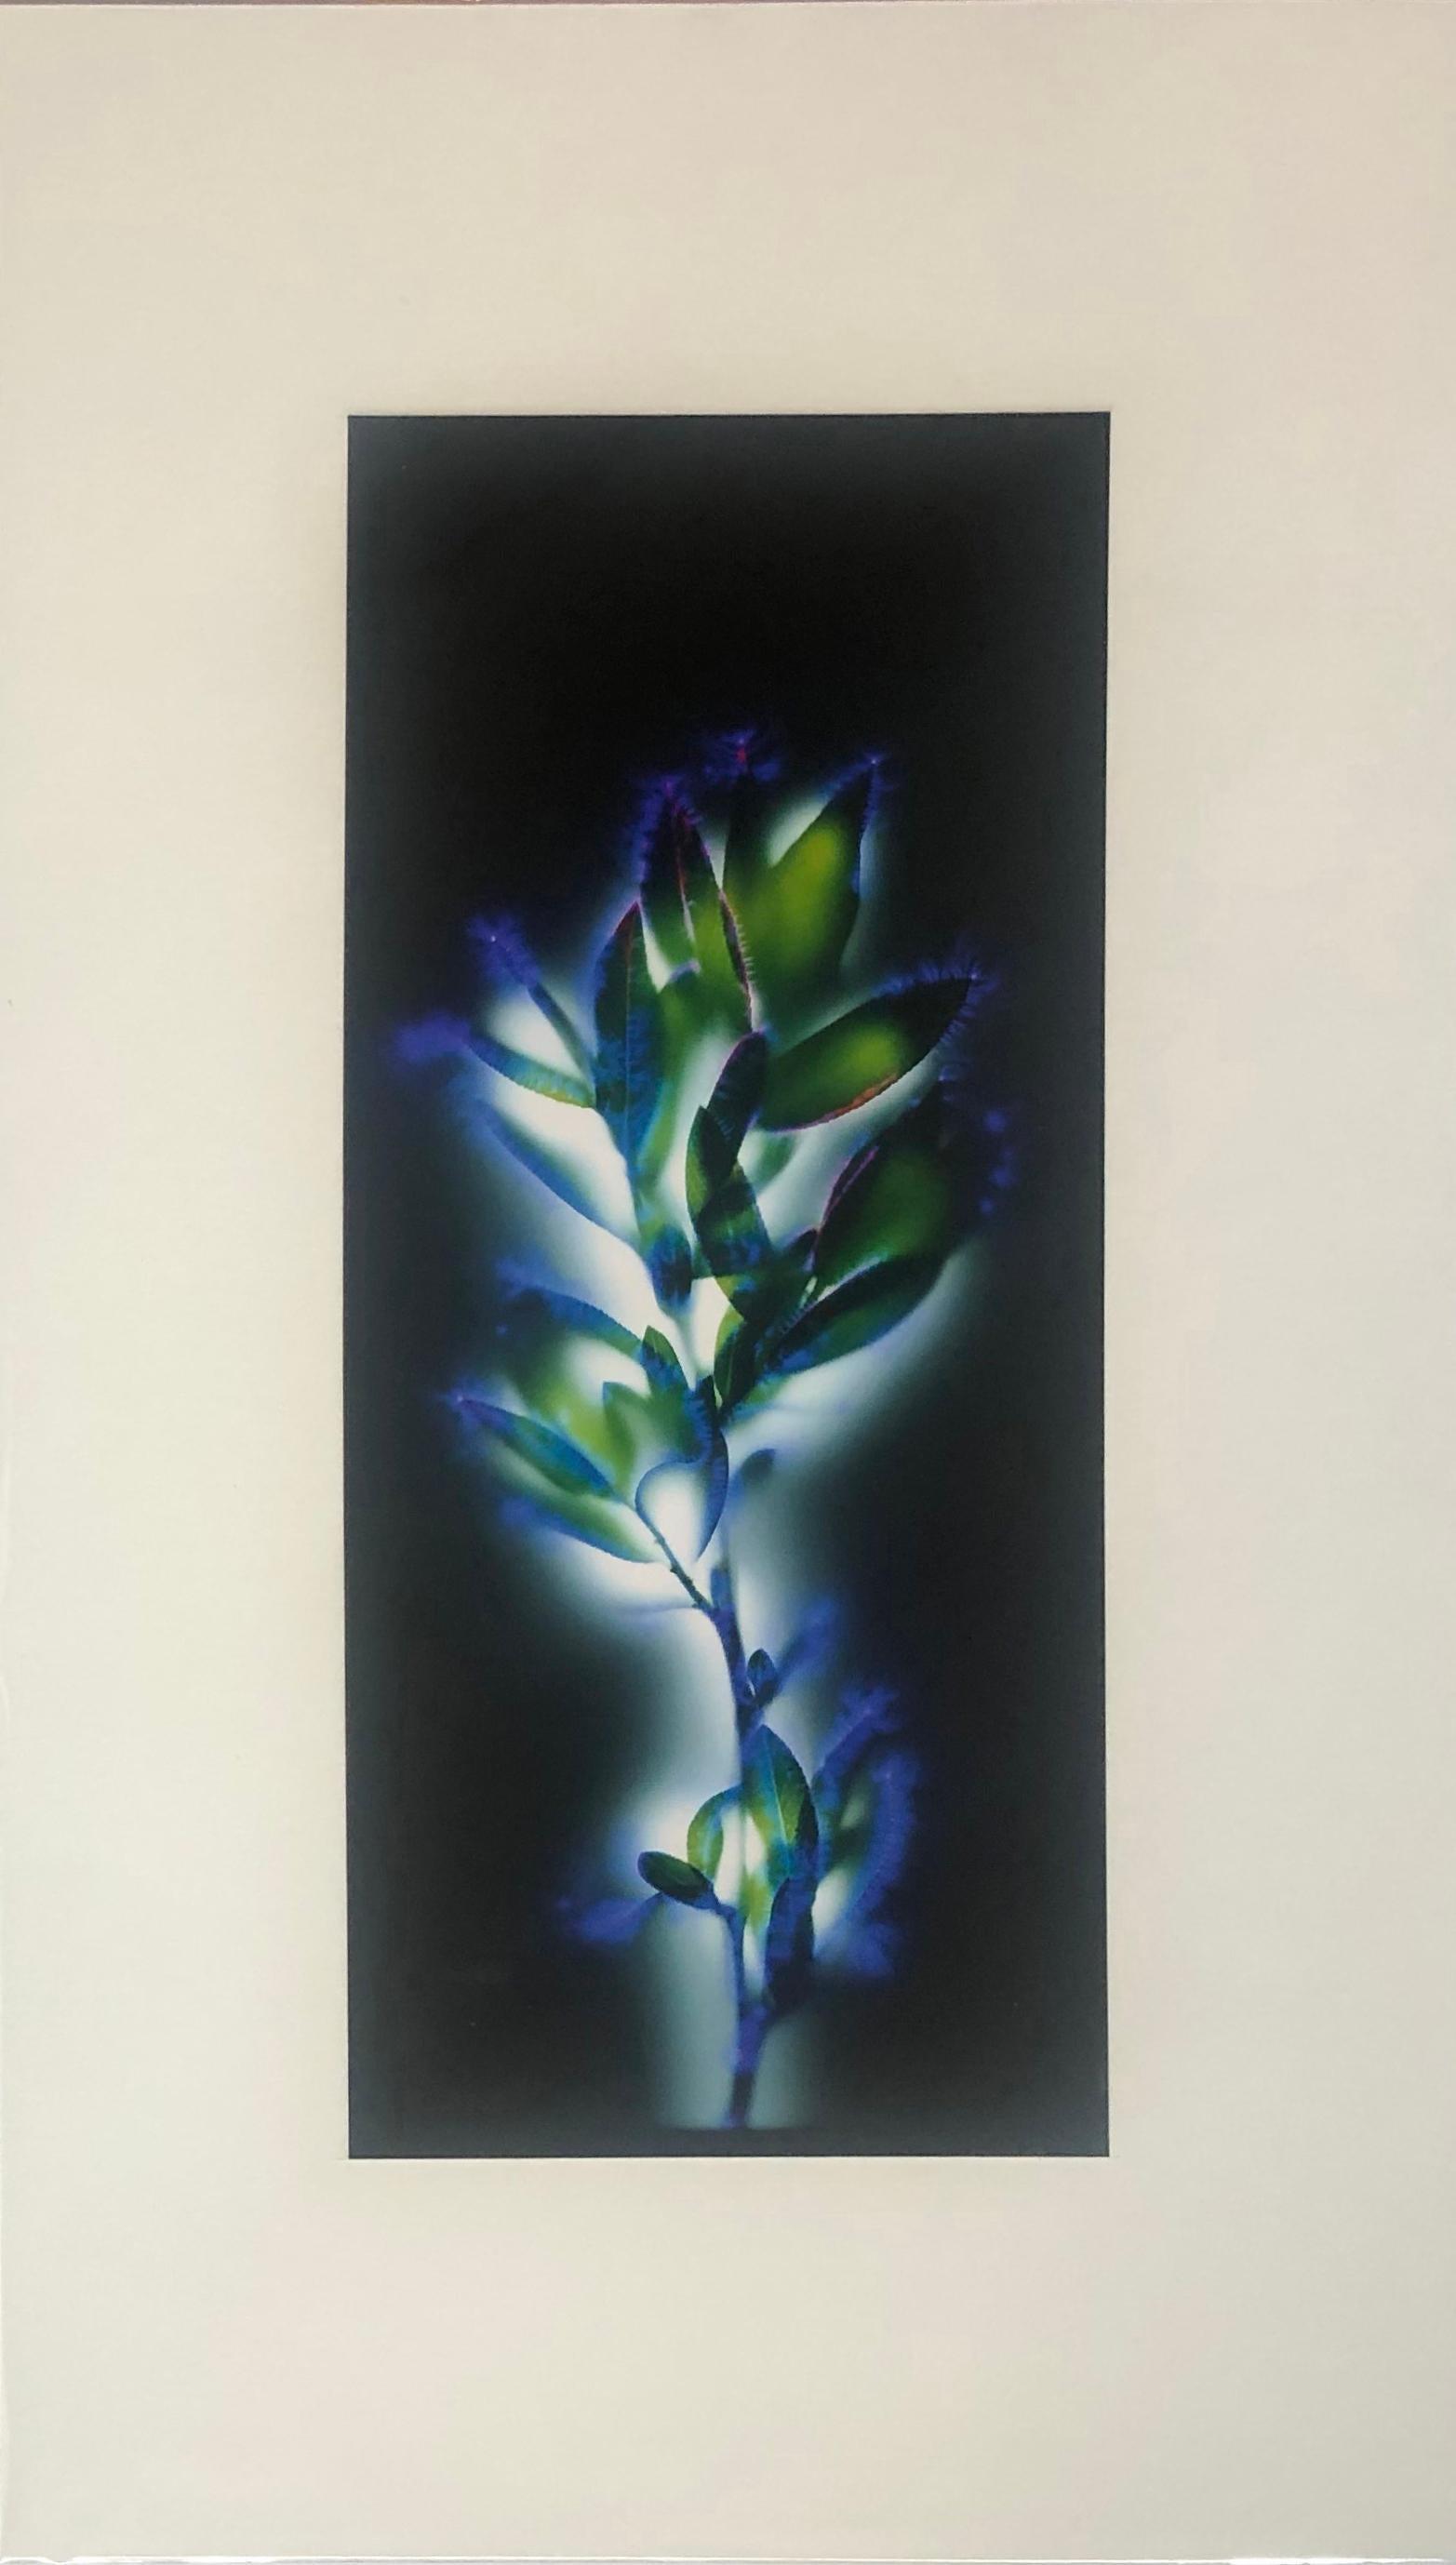 """Willow Budbreak"" by Robert Buelteman, Cameraless photographic print, 2010"